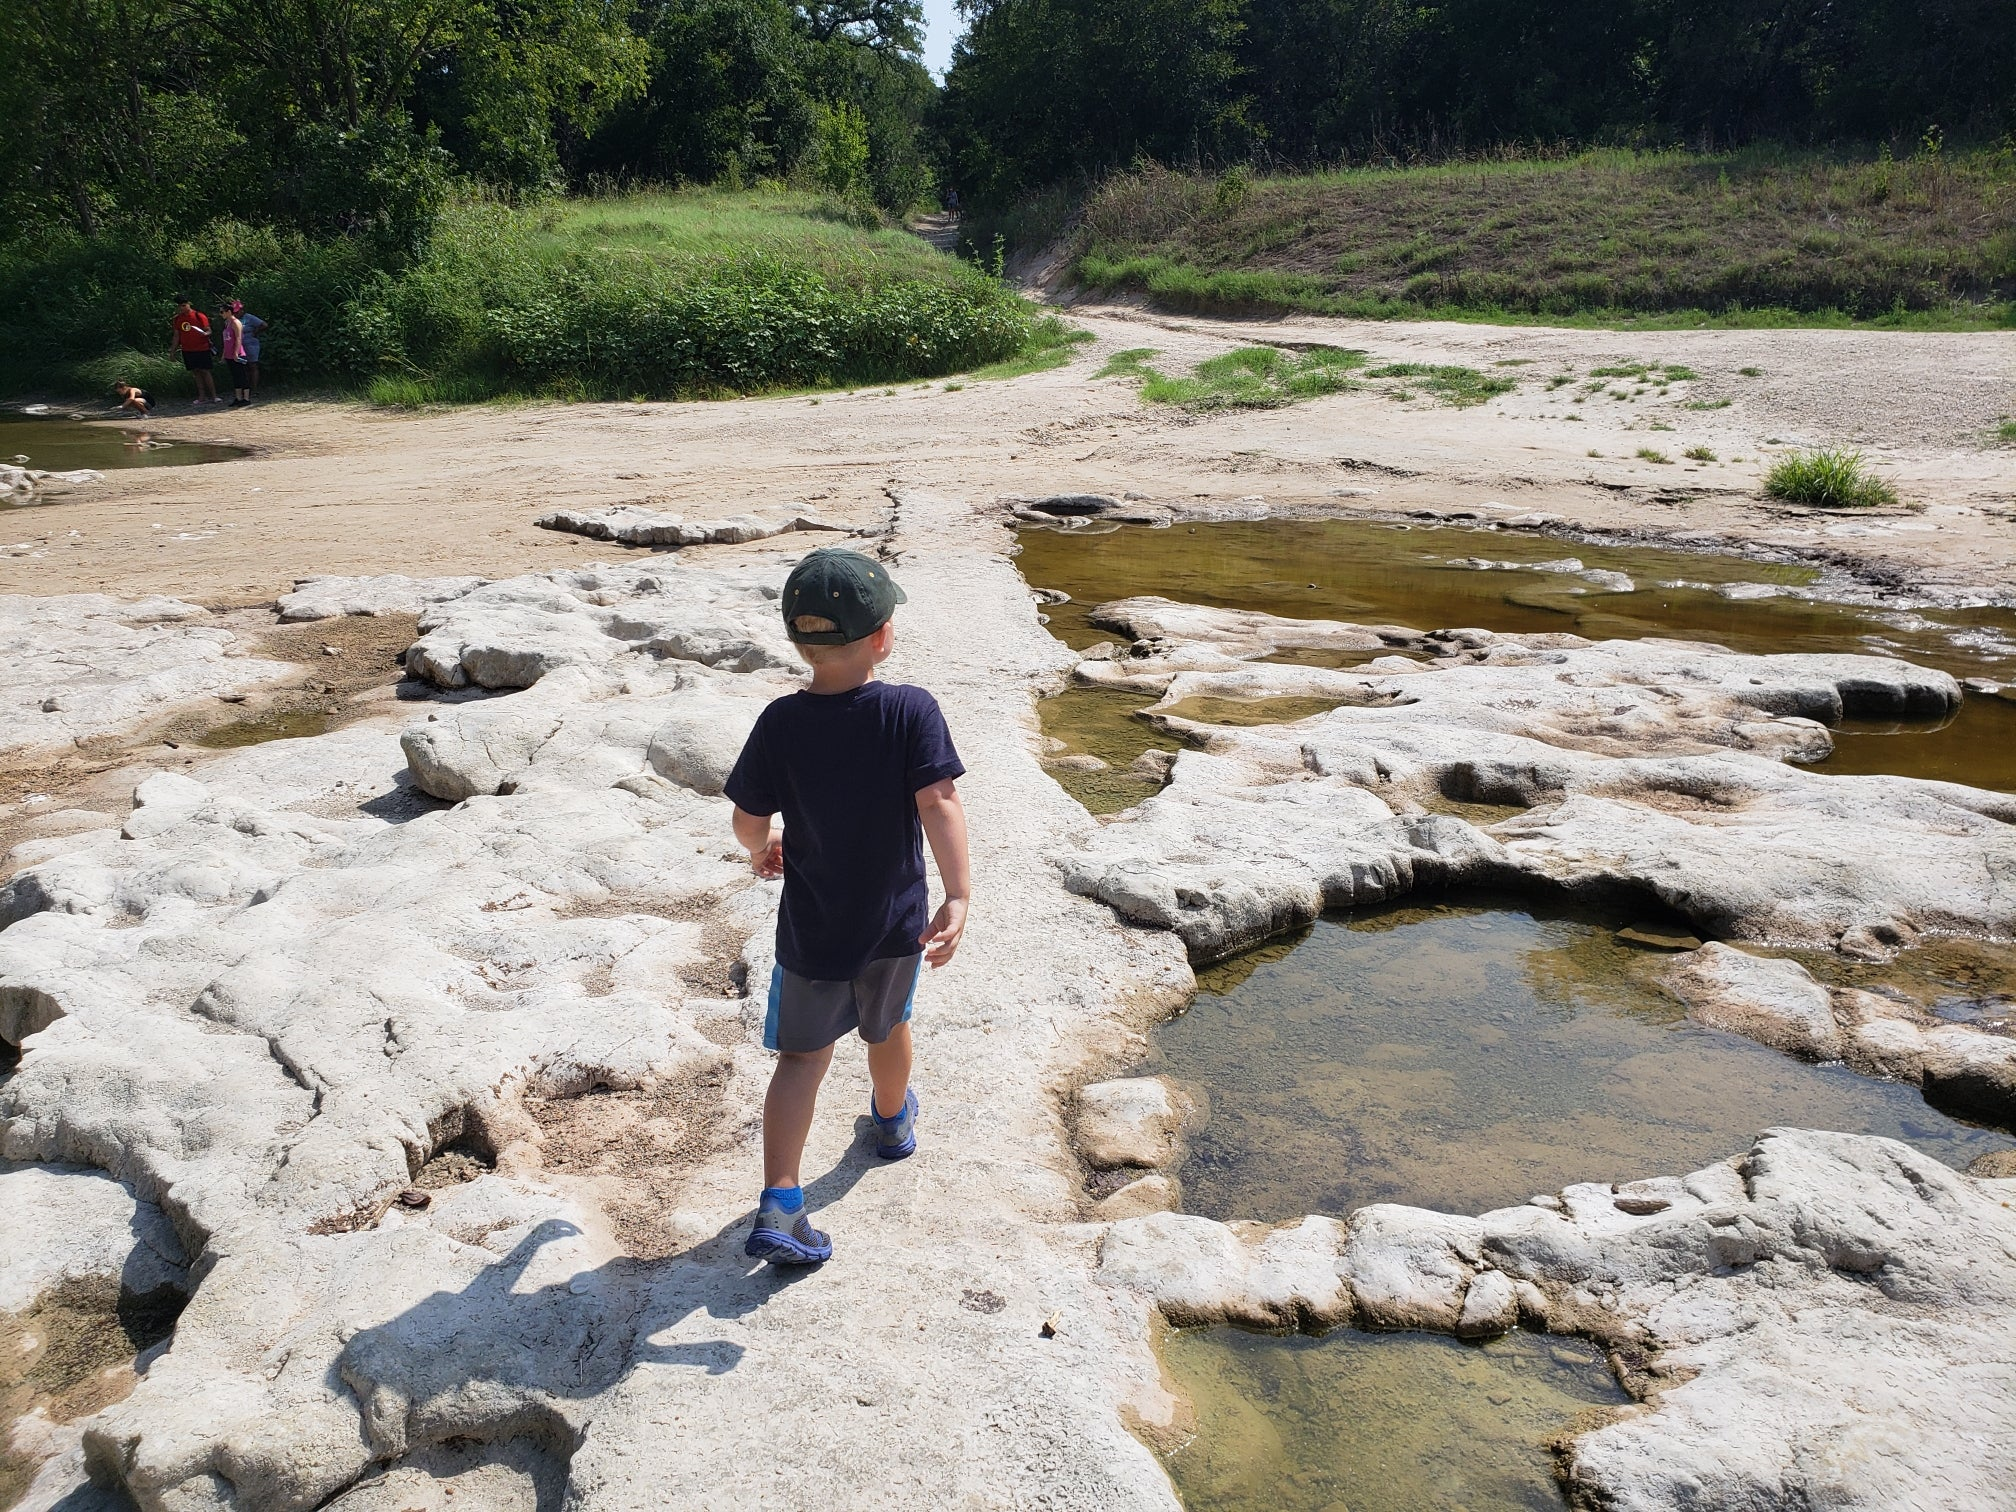 Child walking in Dinosaur park among fossils